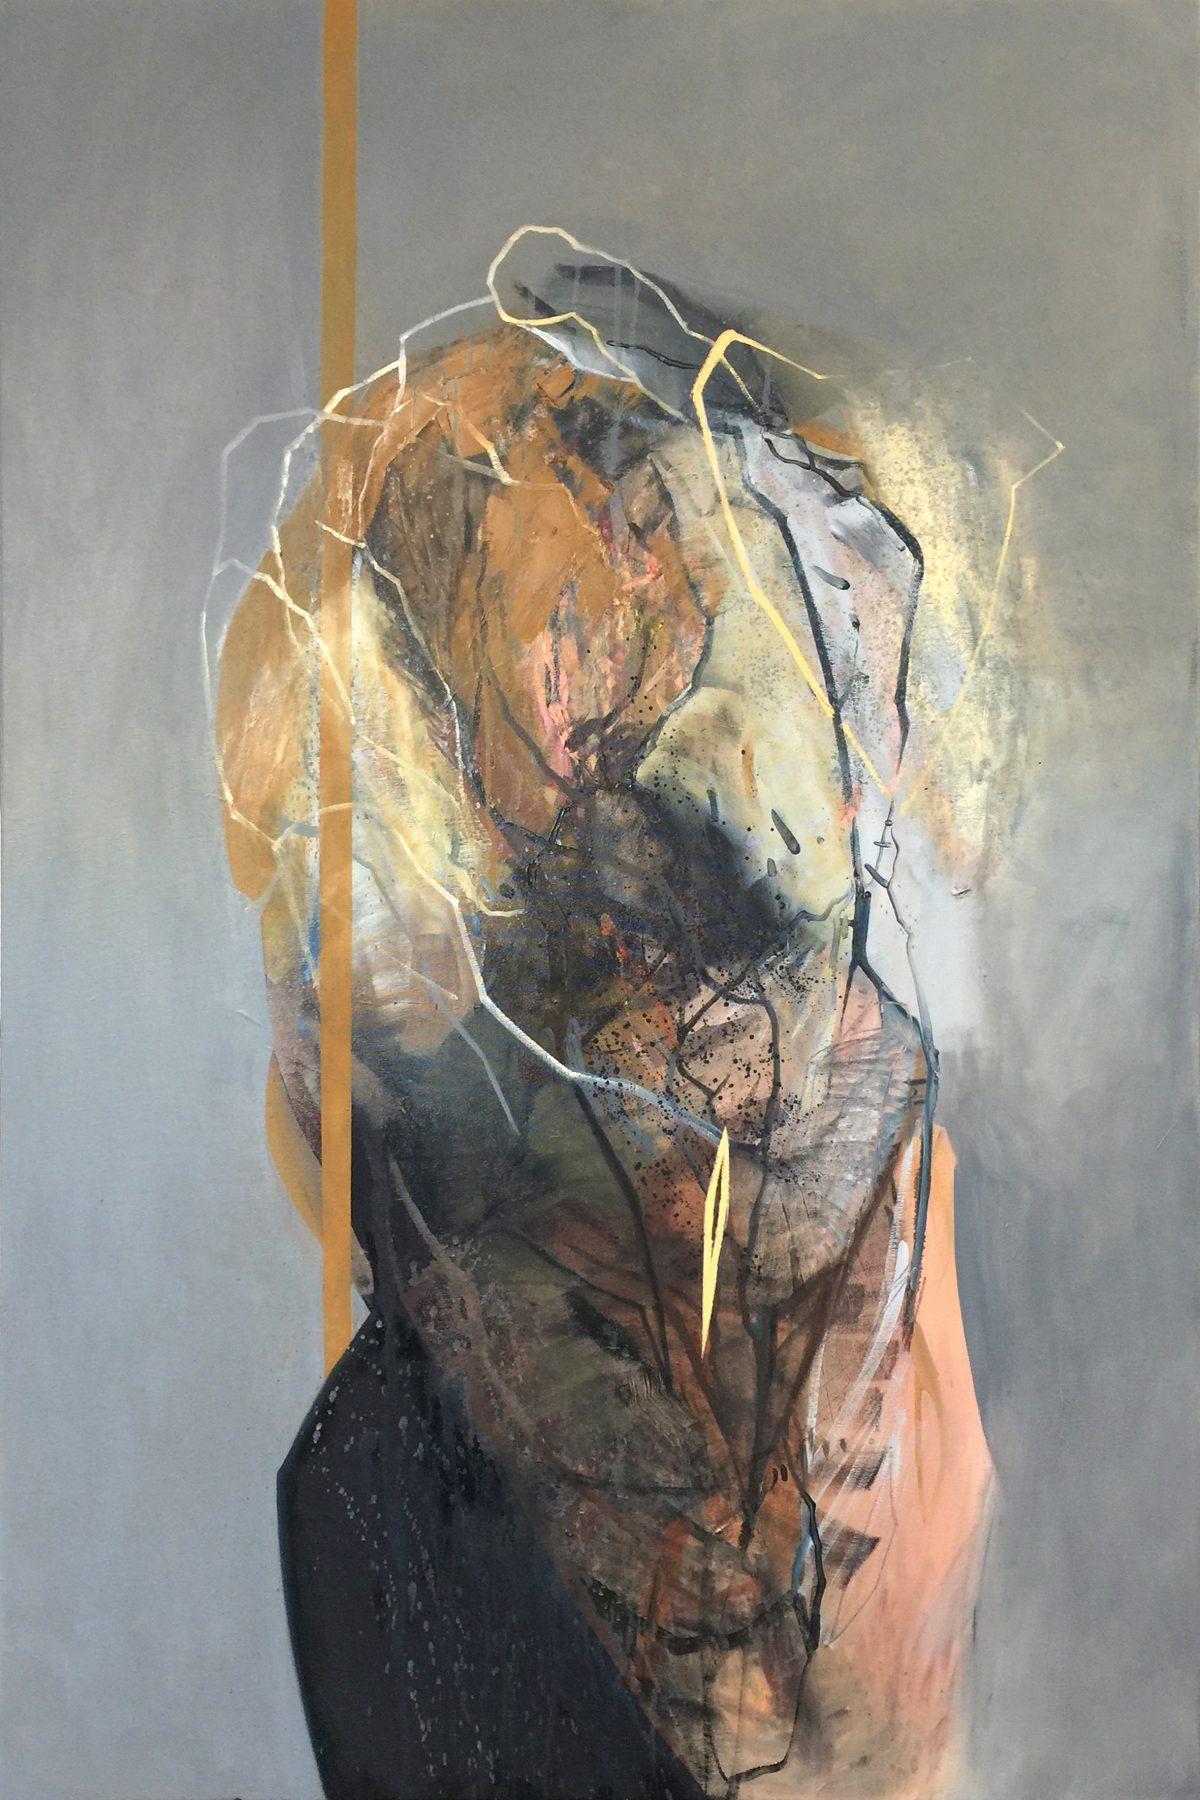 Fragments 1, acrylic and oil on canvas, 2019, 100x150 cm